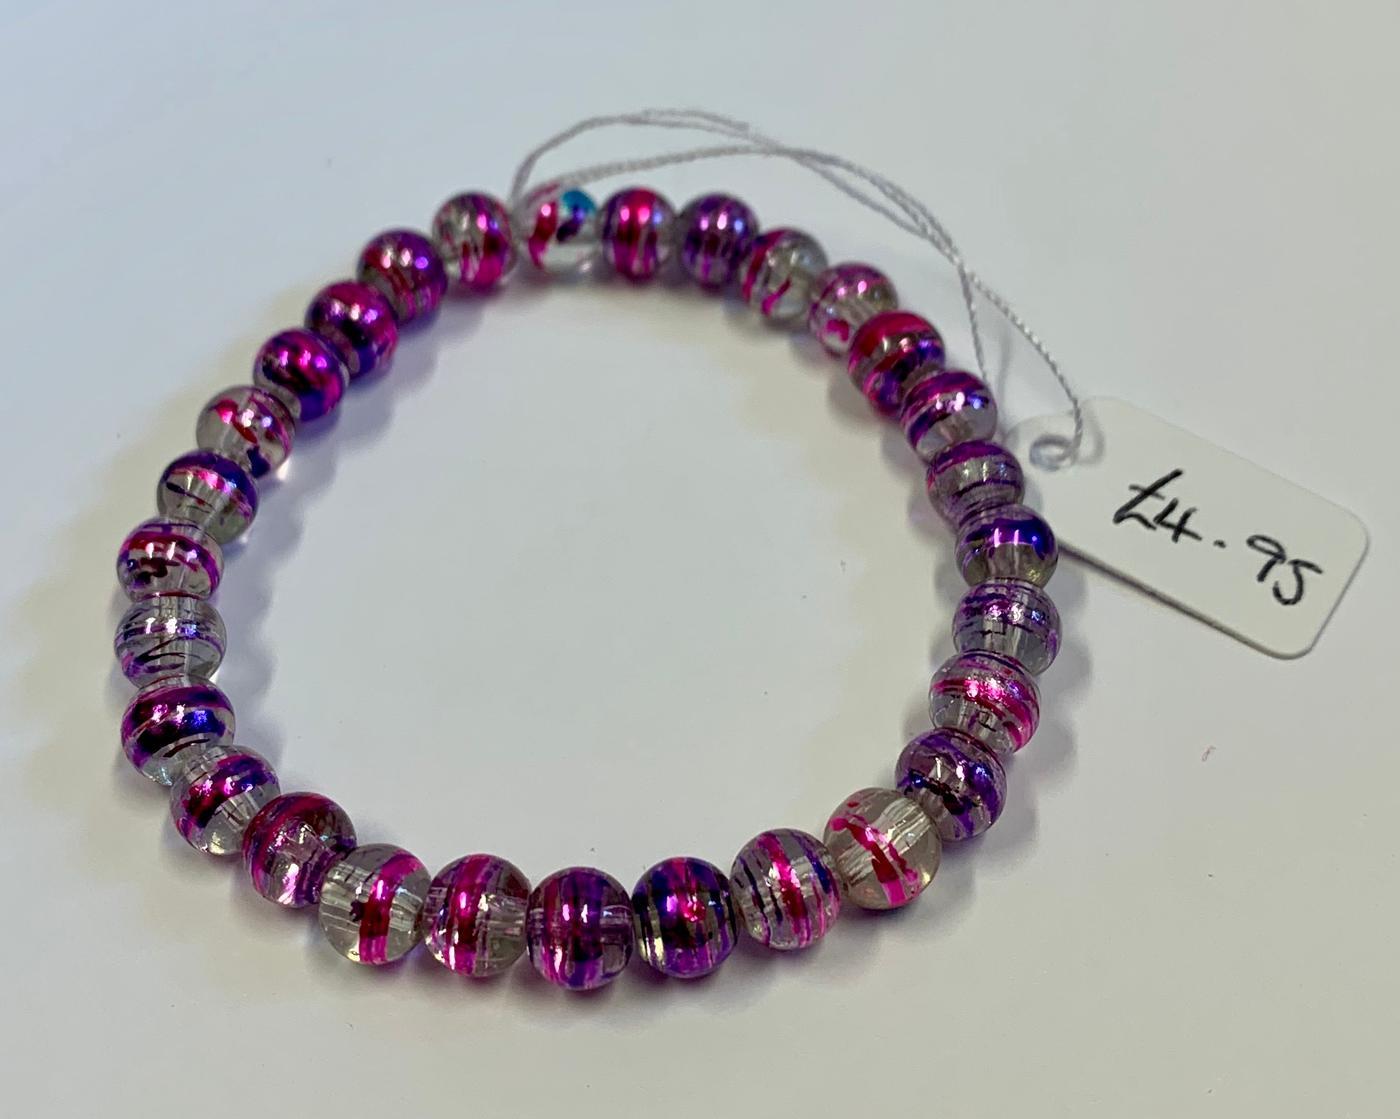 Kerry's Crafts elasticated resin-acrylic bead bracelet